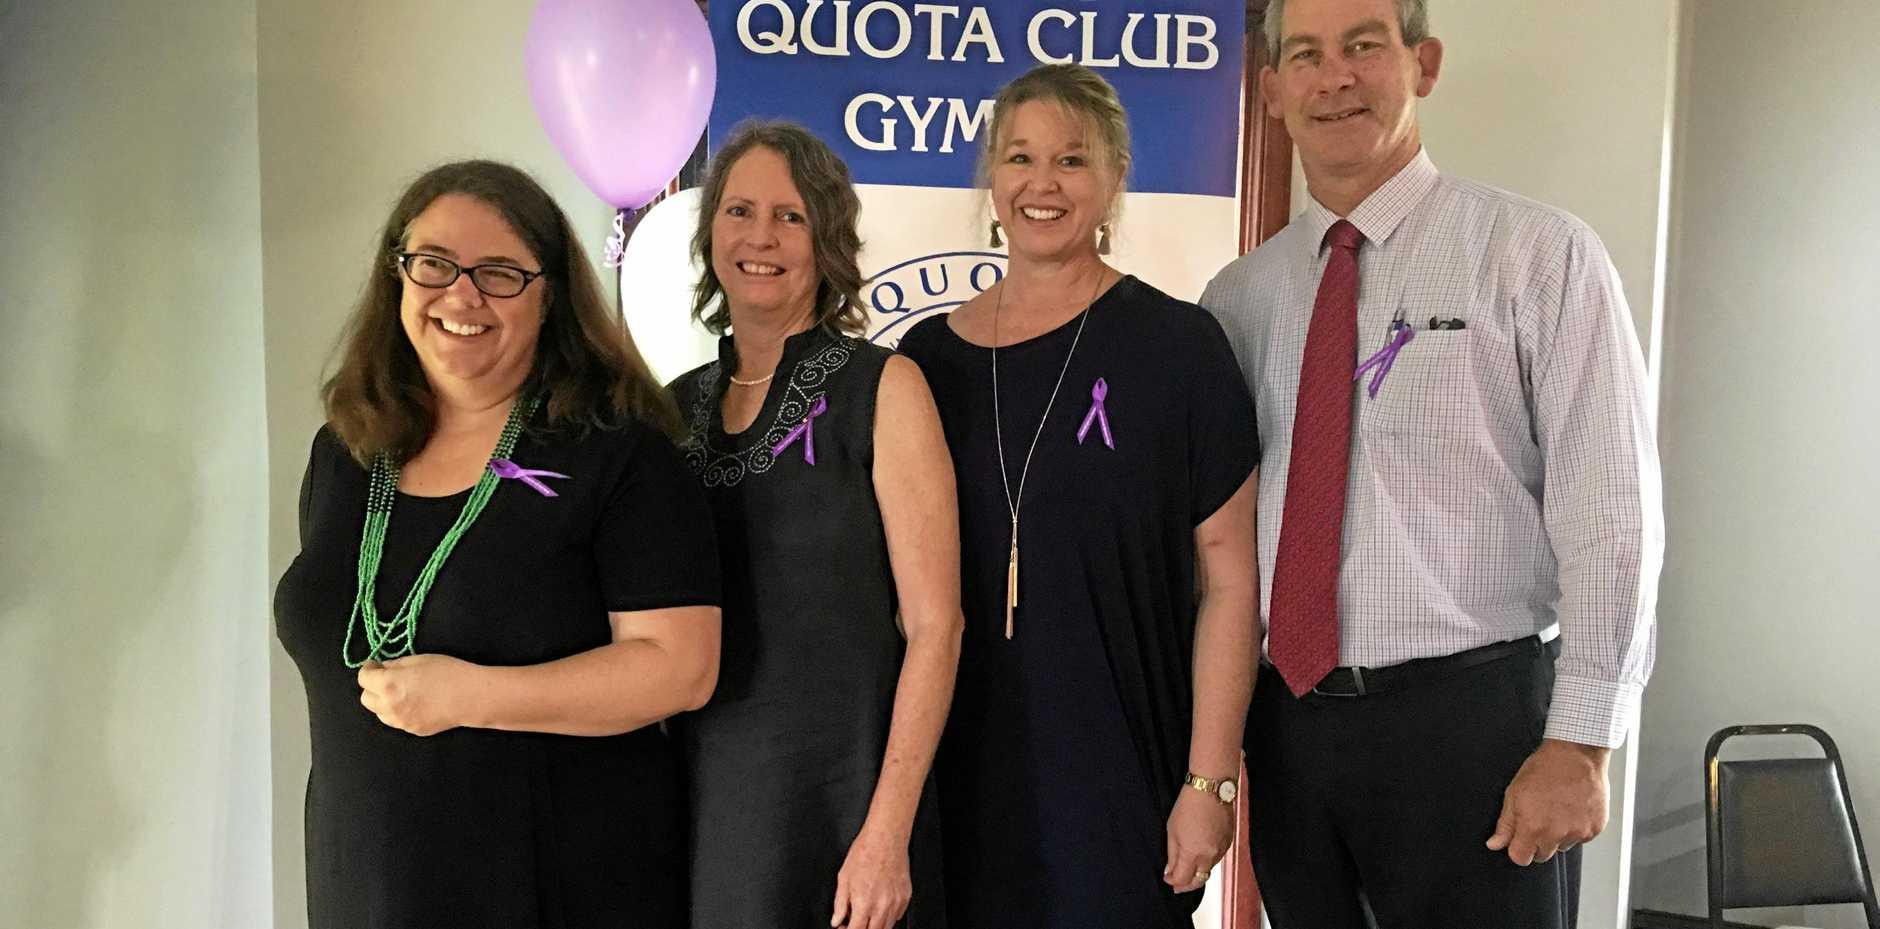 Mayor Mick Curran (far right), with Quota Club members Carolyn Mandersloot, Jenny Blyth, and Sue Curran.